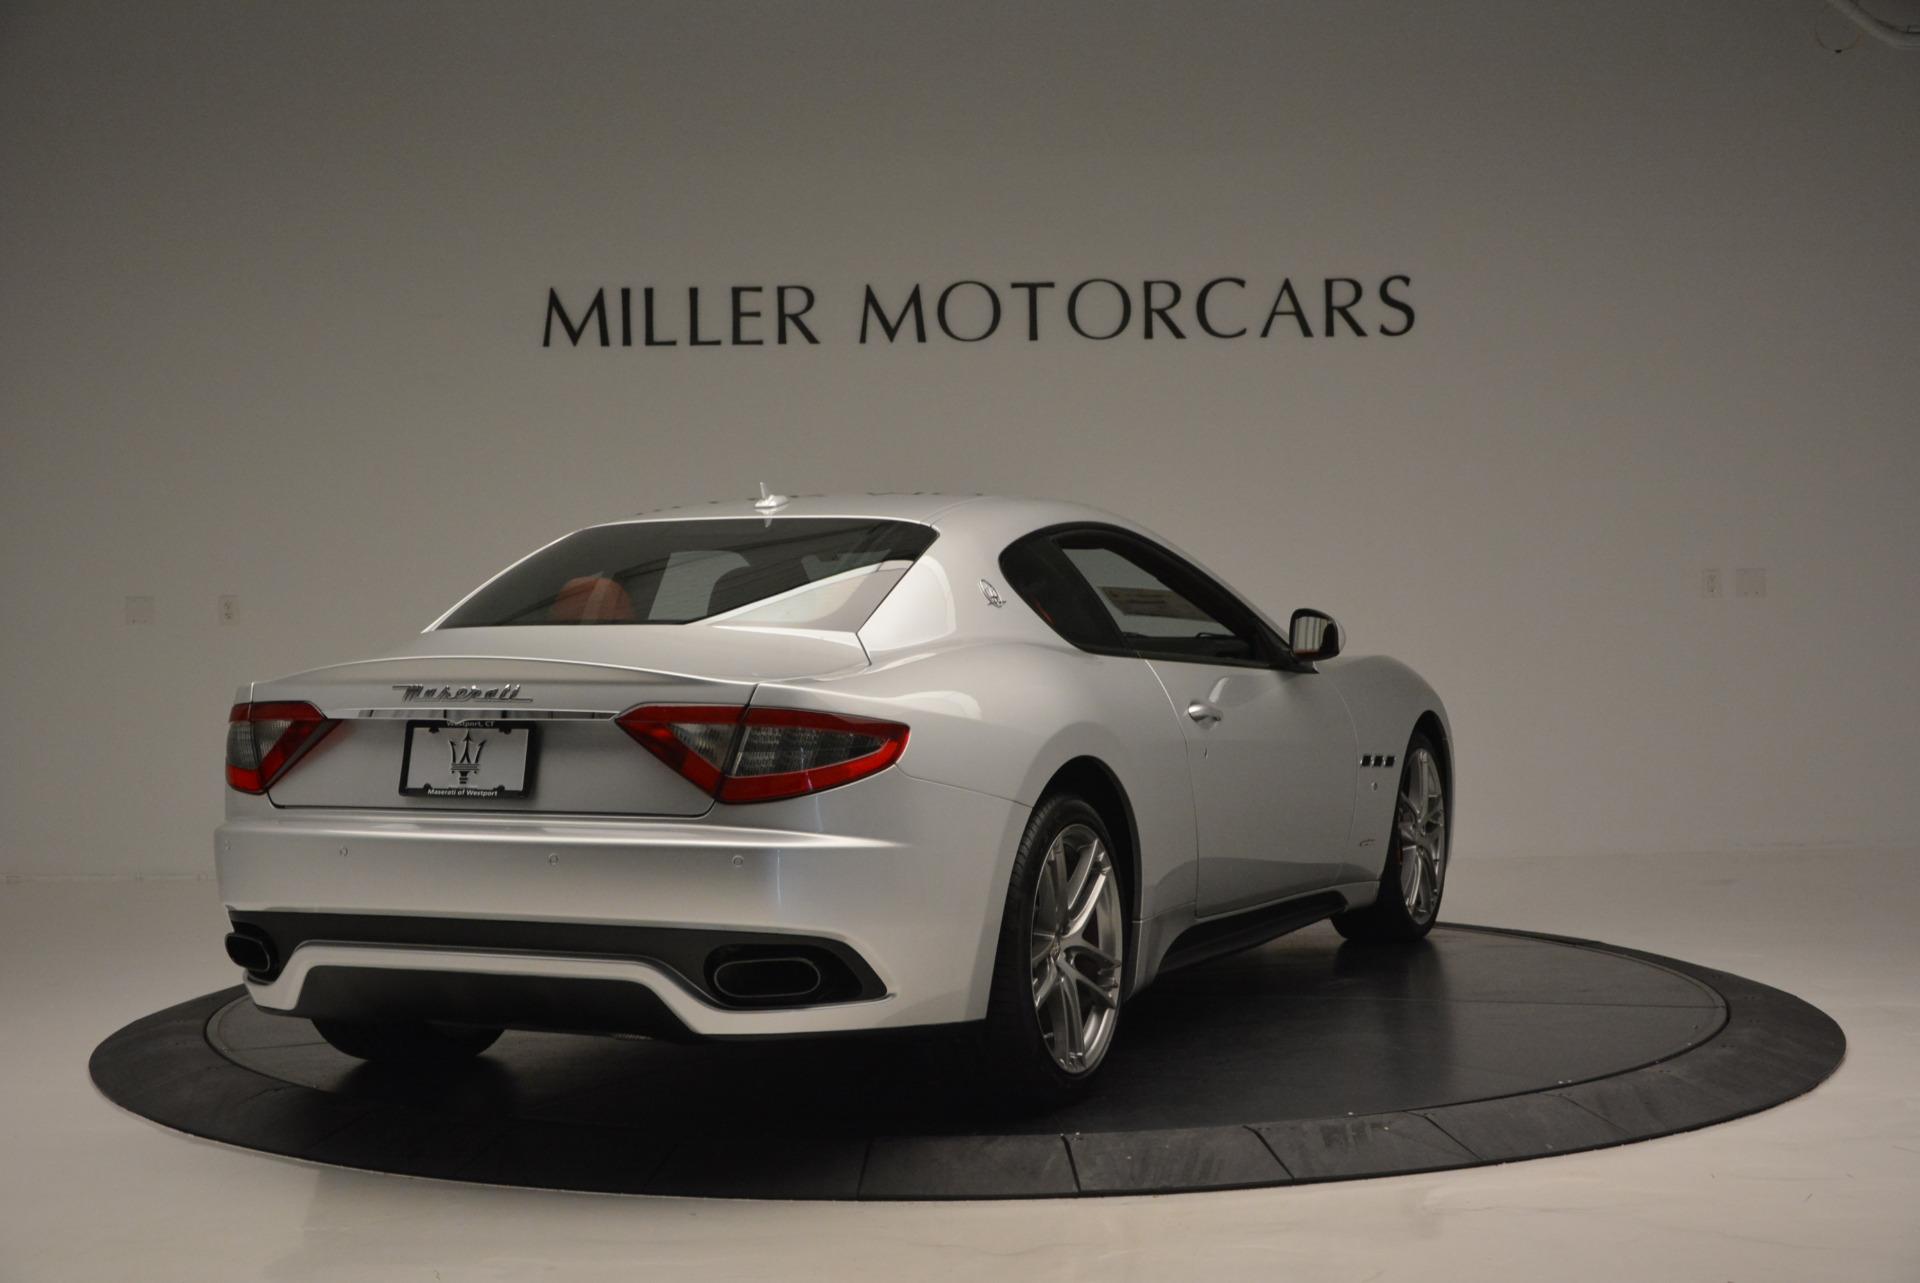 New 2017 Maserati GranTurismo Sport For Sale In Westport, CT 594_p7